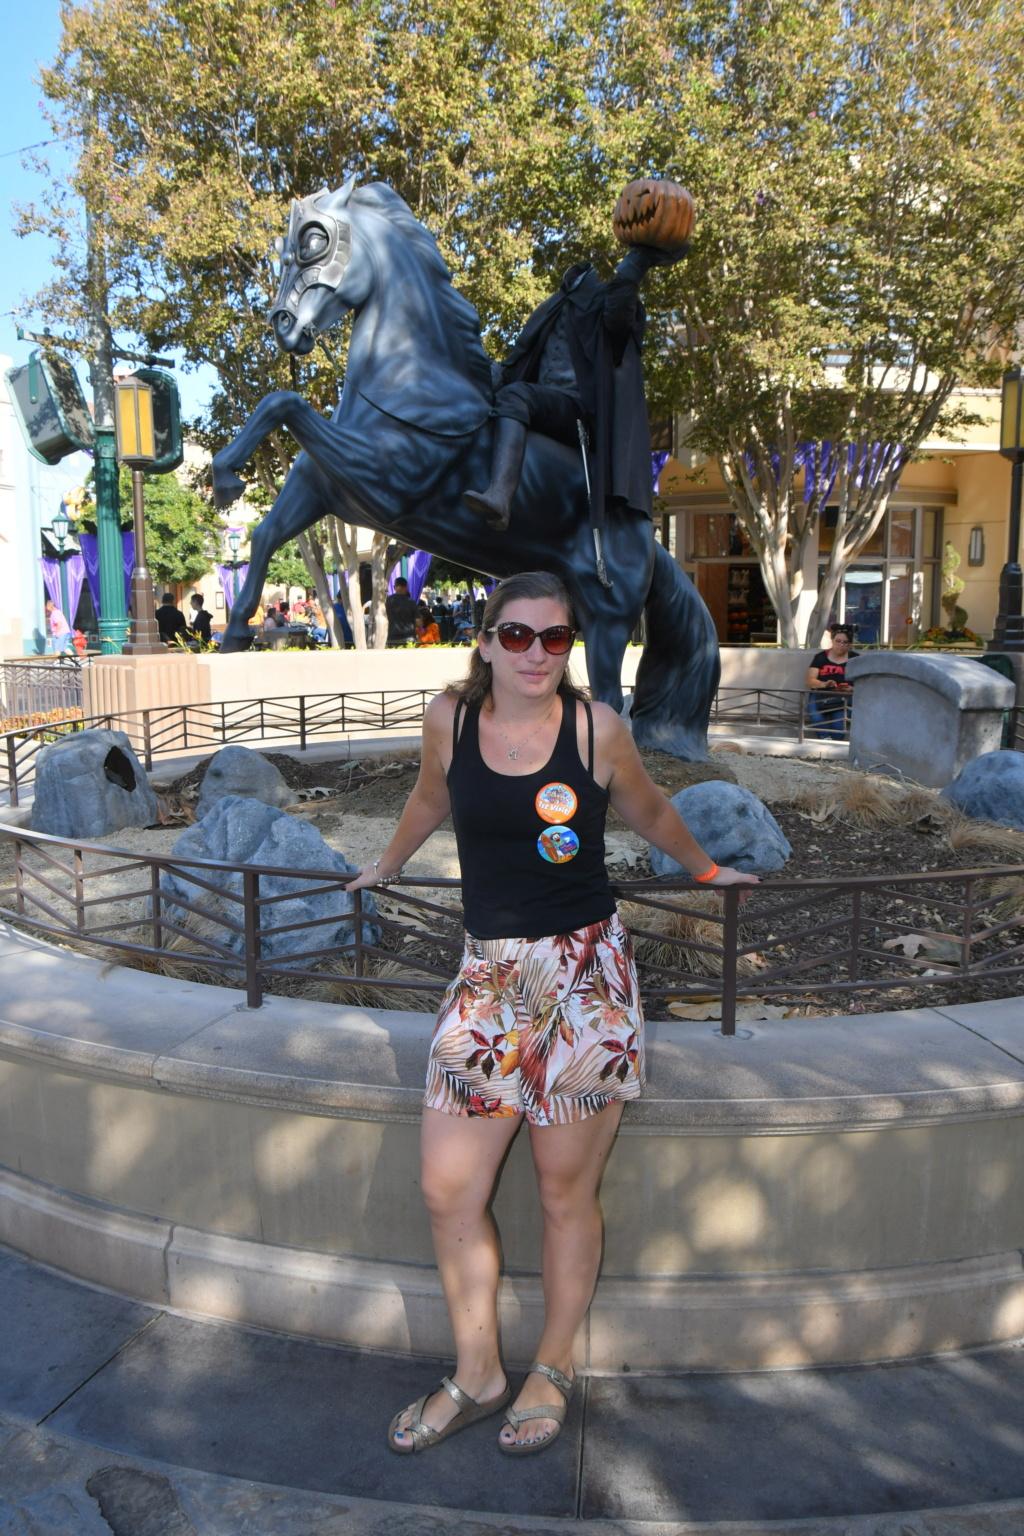 California Dream - Octobre 2019 - Disneyland Ressort à partir de la page 3  - Page 4 Img_0921